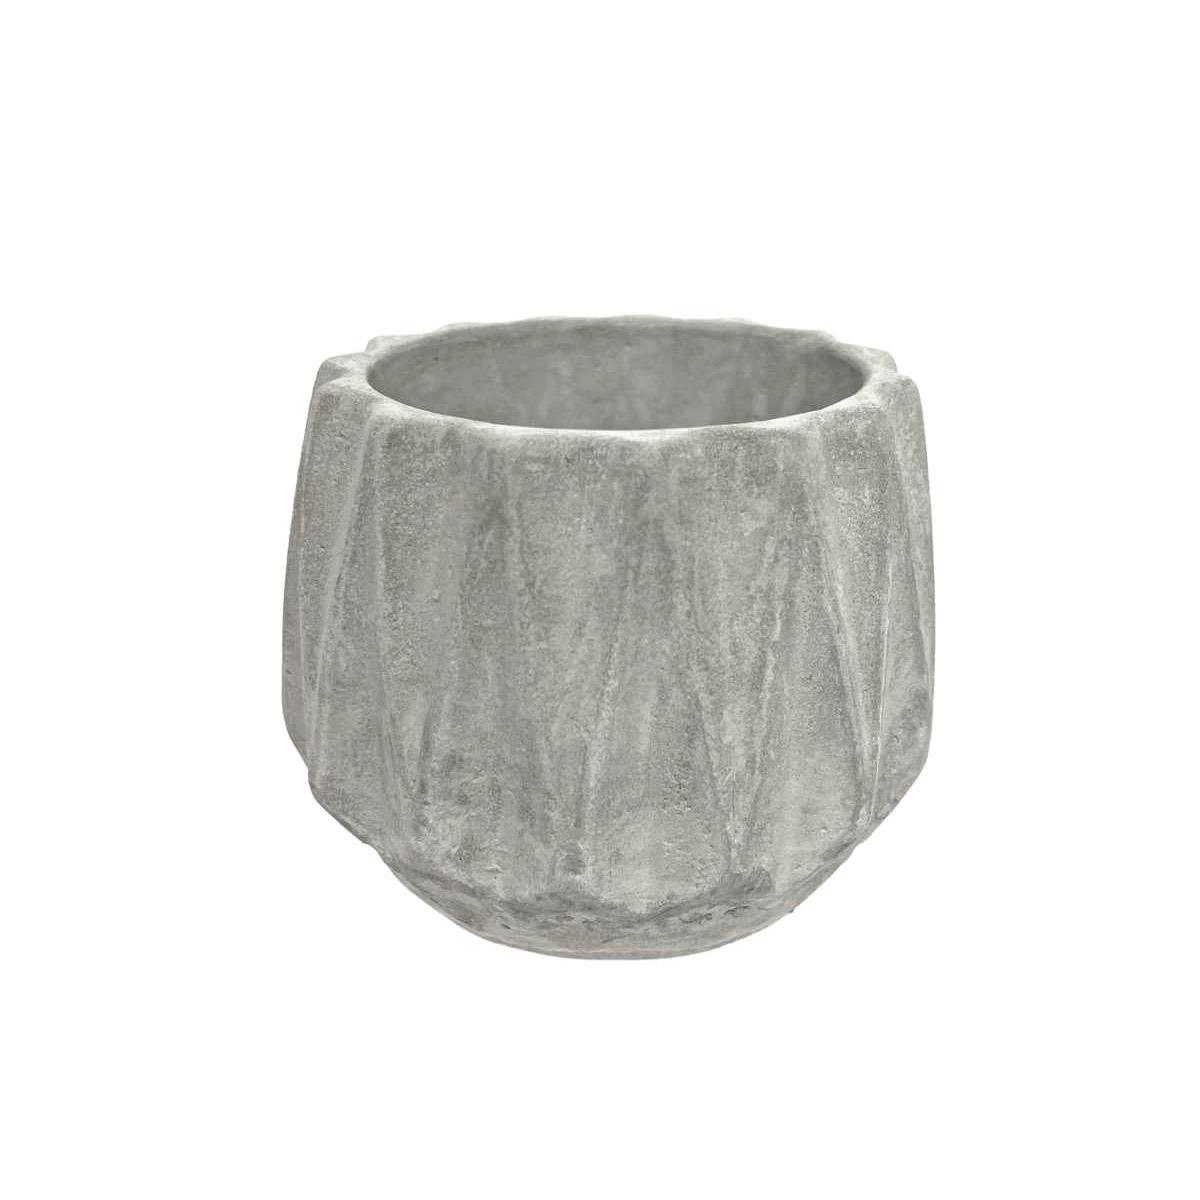 Vaso Cachepot de Cimento Lotus para Plantas e Jardim Vasinho de Suculentas